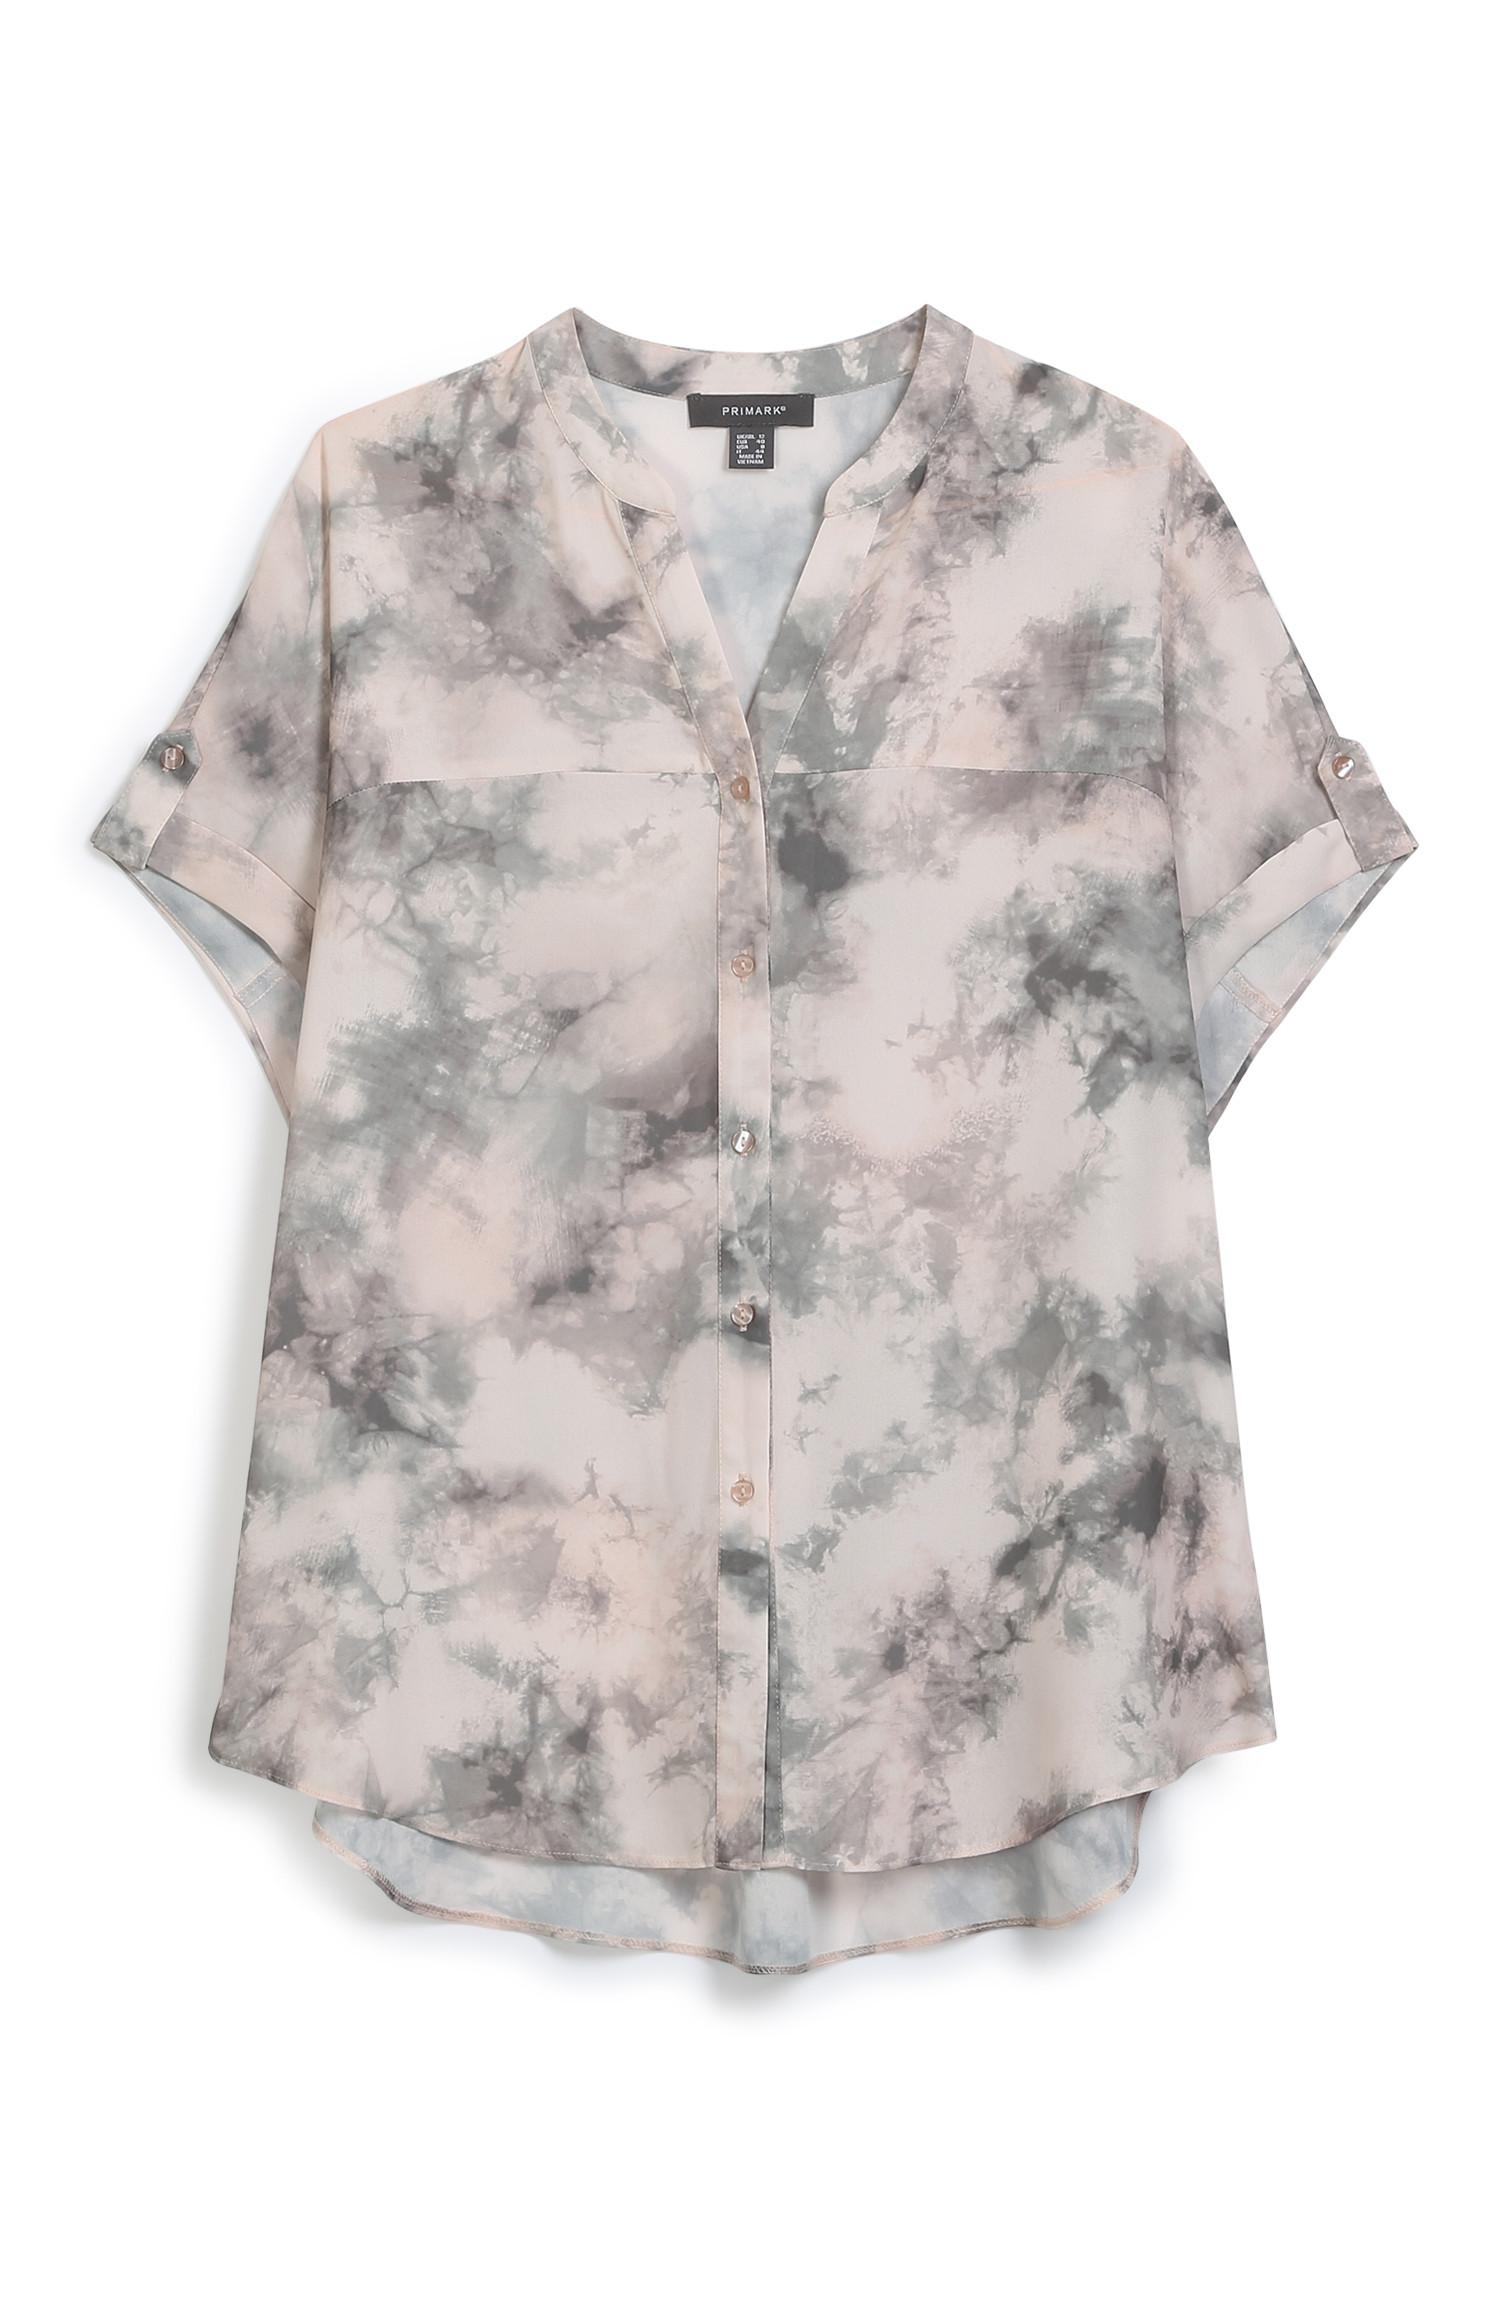 Marble Short Sleeve Shirt